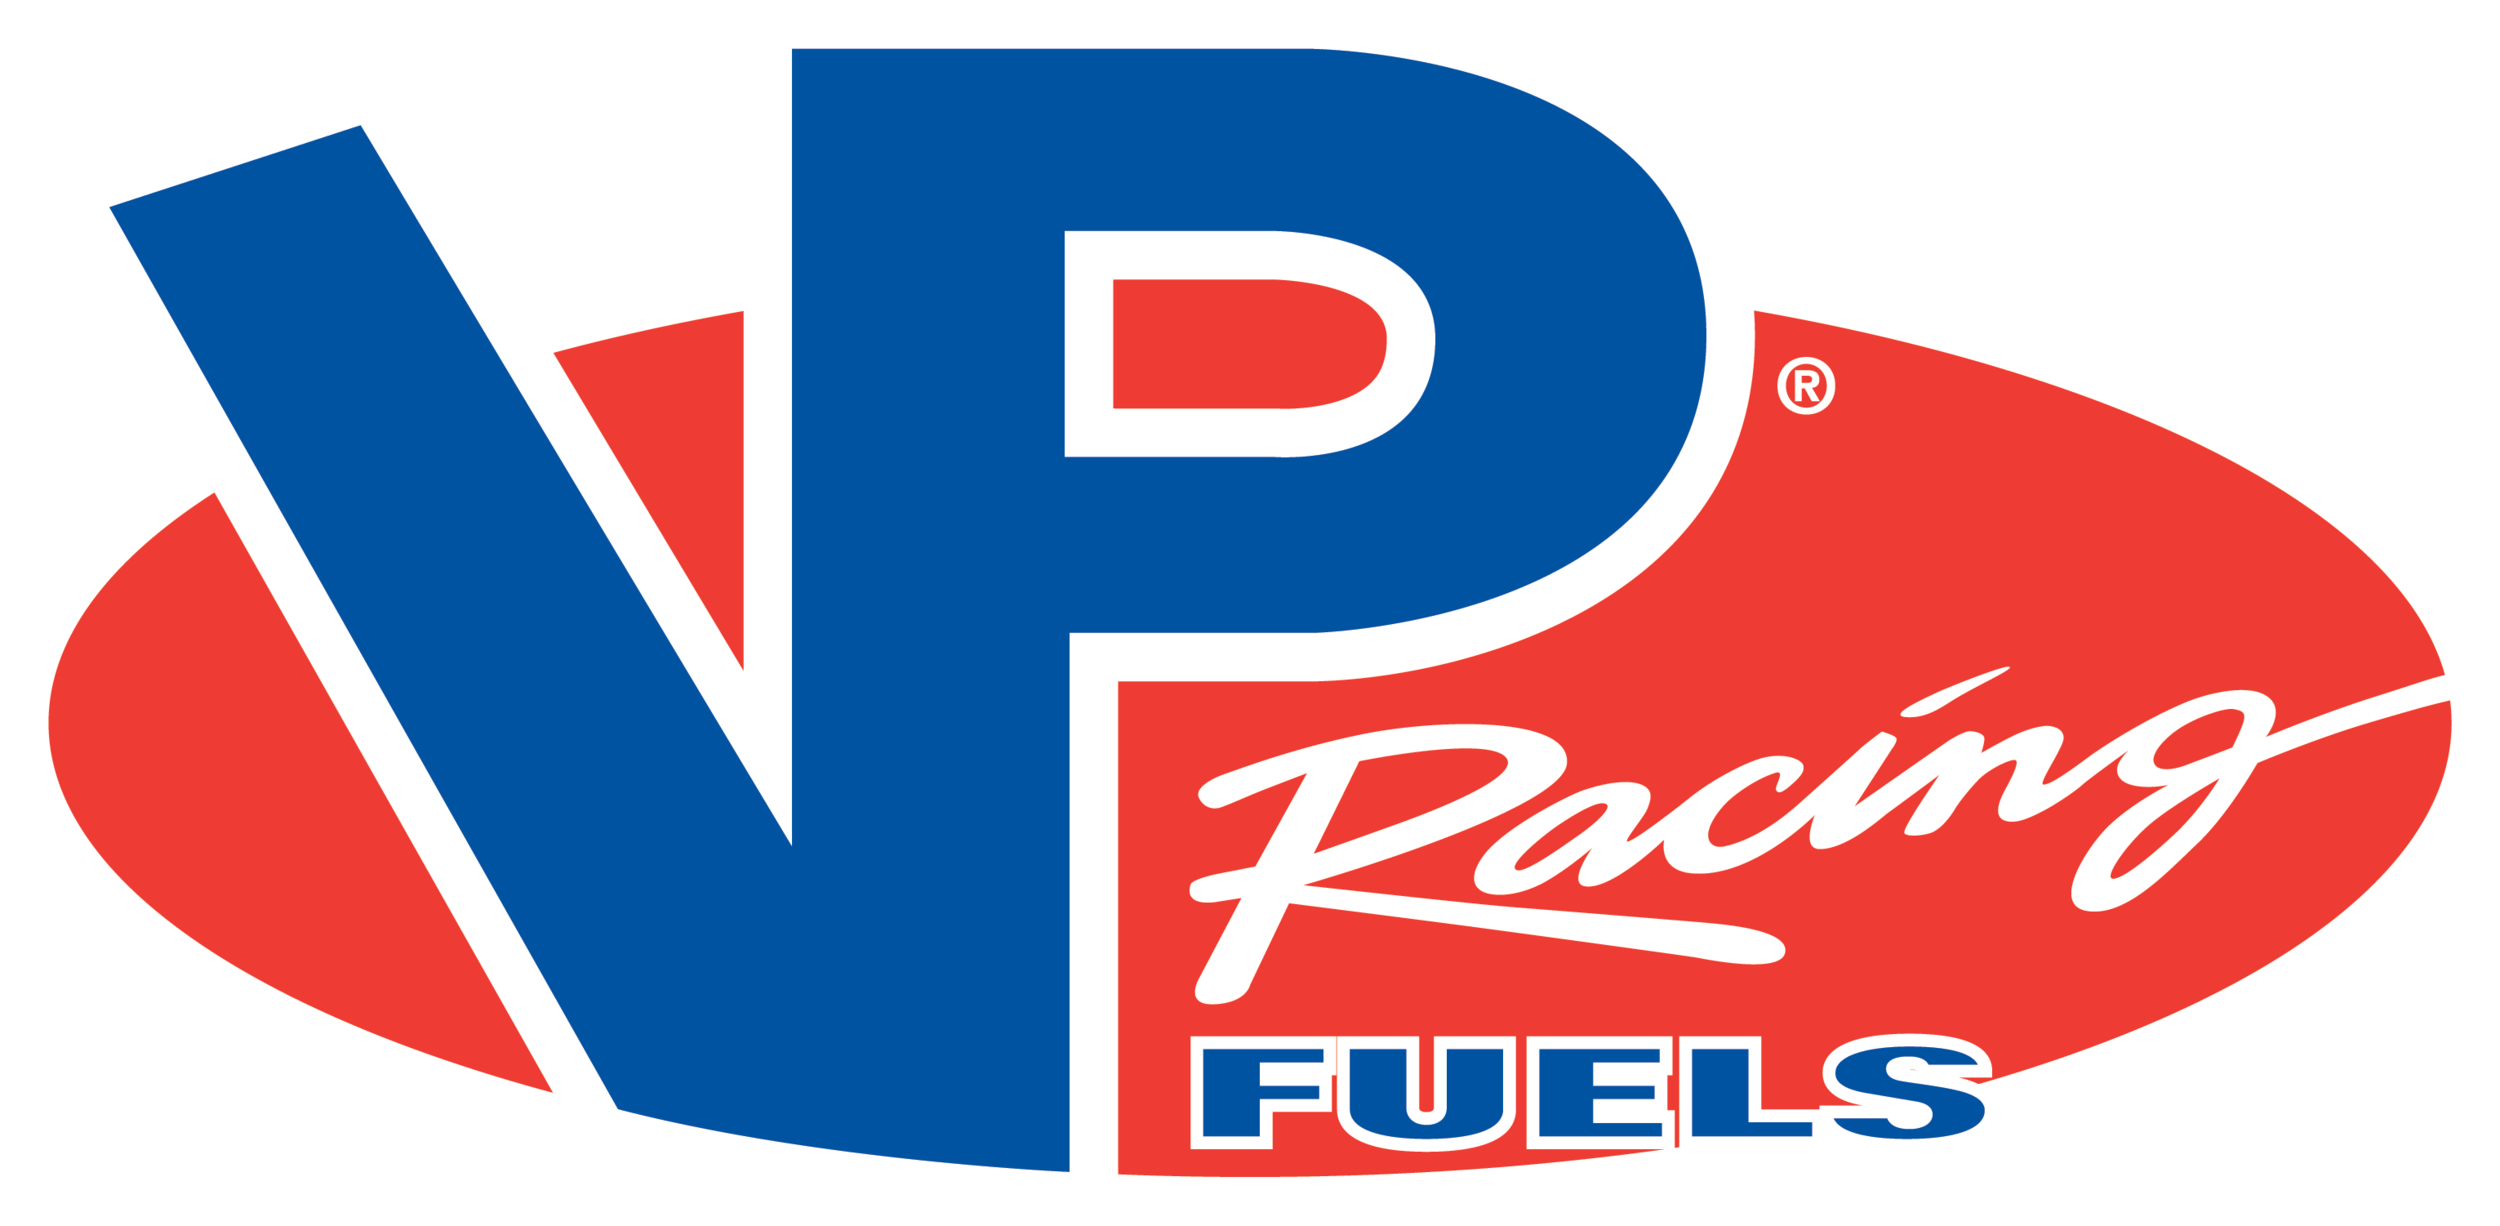 VP-Logos-Master_081318A_VP Squash logo.png